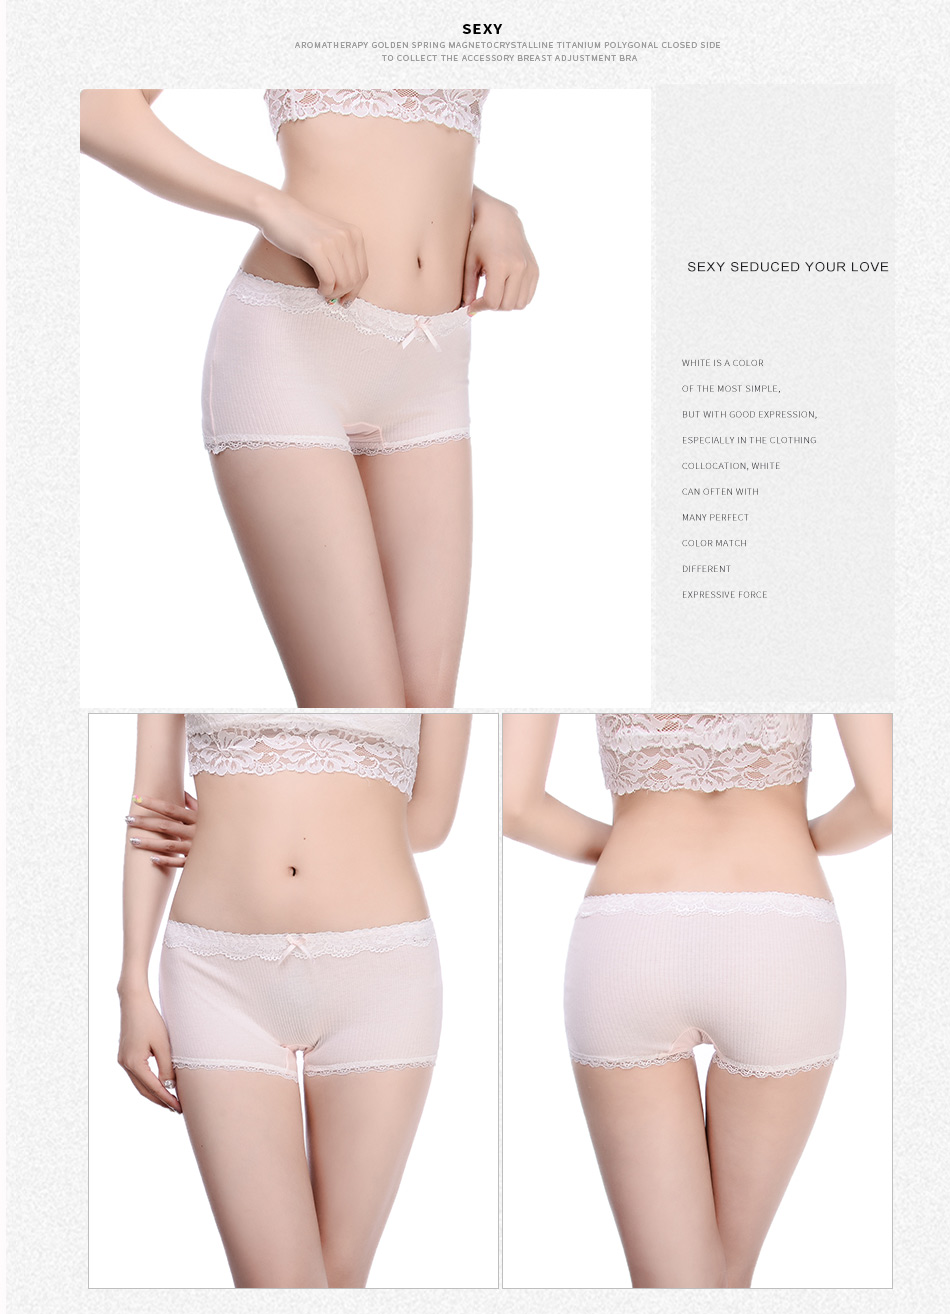 b4dc295713a3 Innsly Women briefs Low-Rise Panties Female Sexy Panties 100% Cotton Animal  print briefs Ladies lingeries Women UnderwearUSD 1.39-1.55 piece